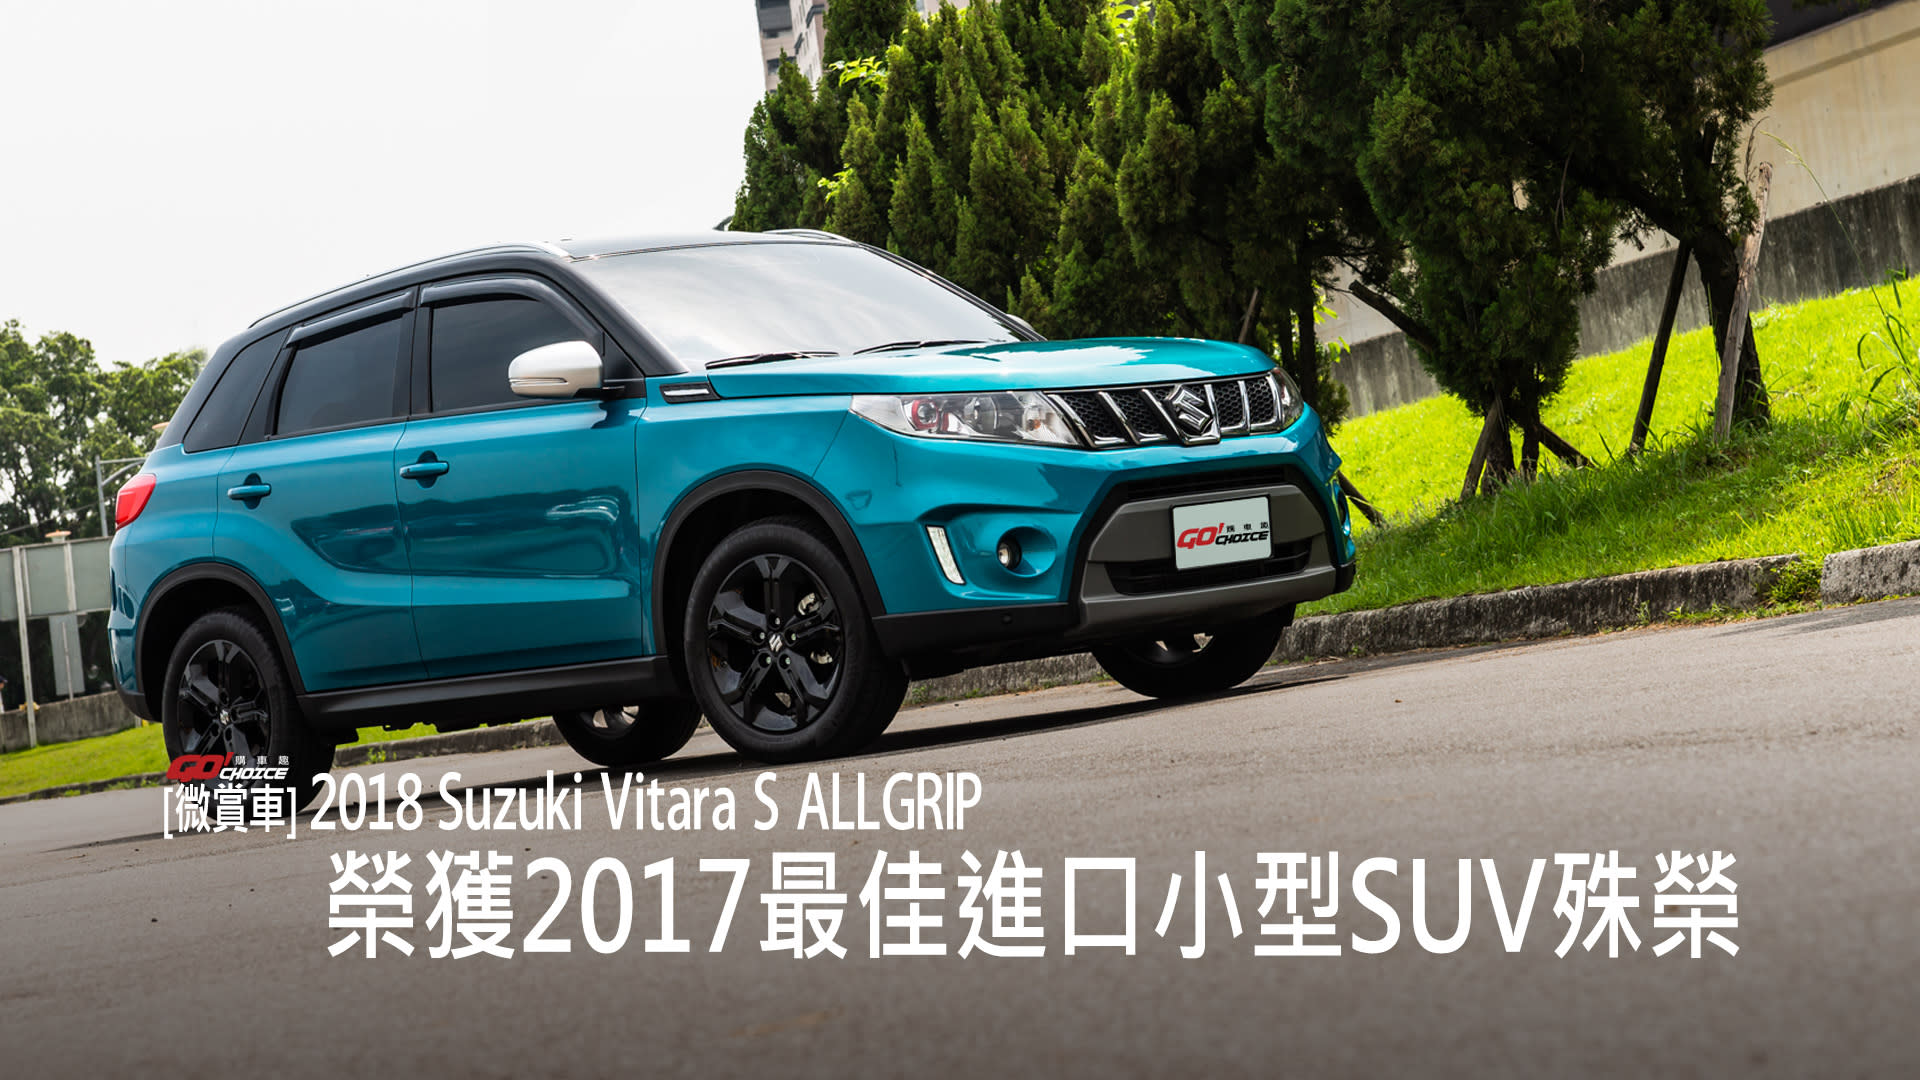 【GoChoice購車趣】2018 Suzuki Vitara S ALLGRIP_榮獲2017最佳進口小型SUV殊榮